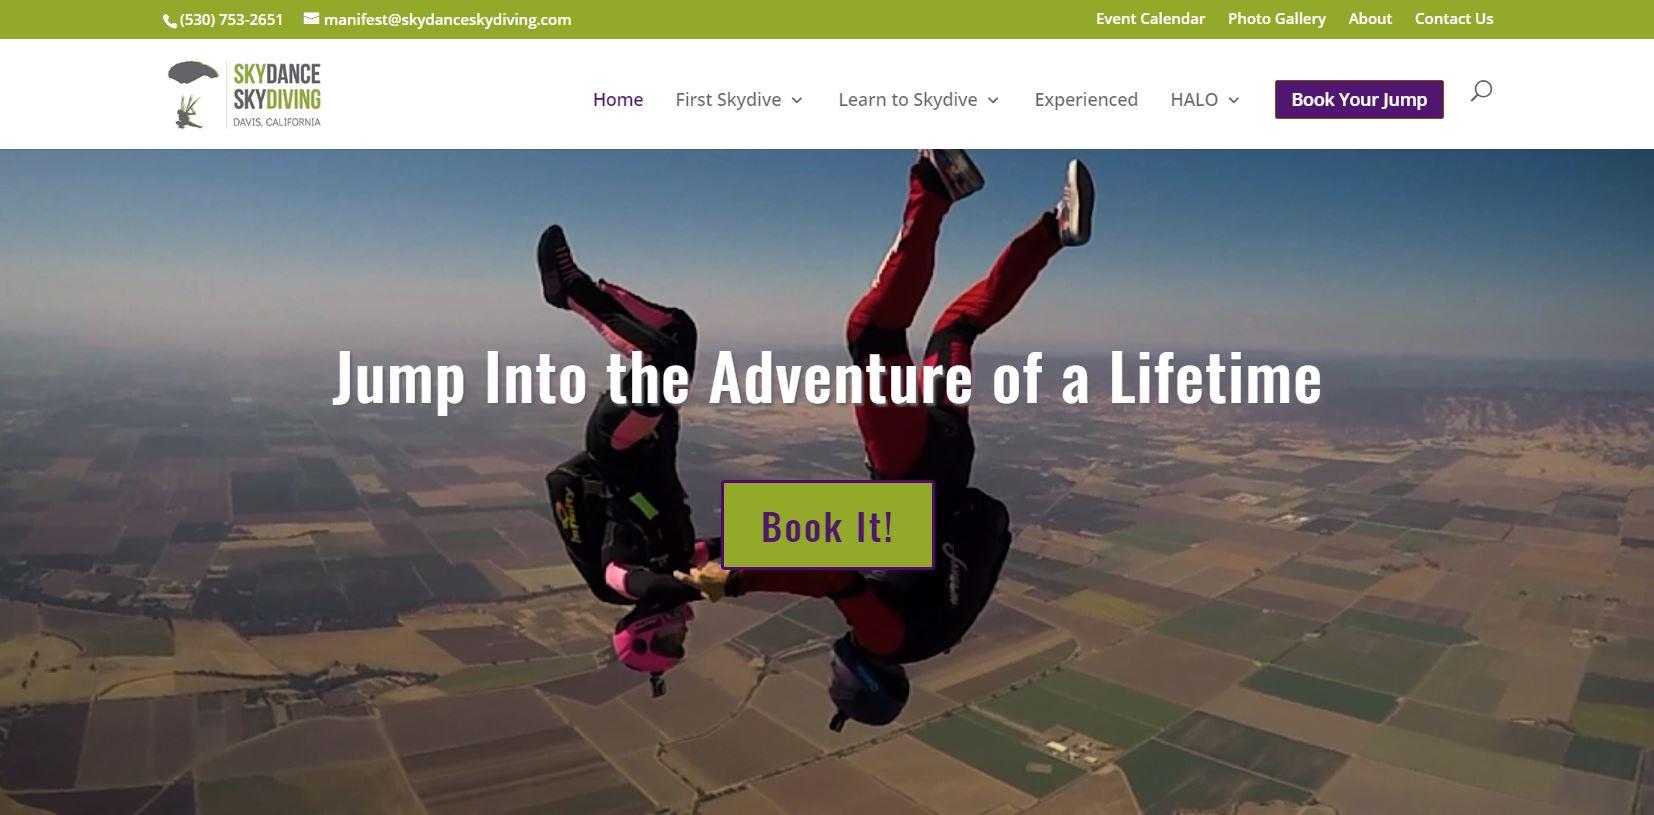 Skydance Skydiving in Yolo County